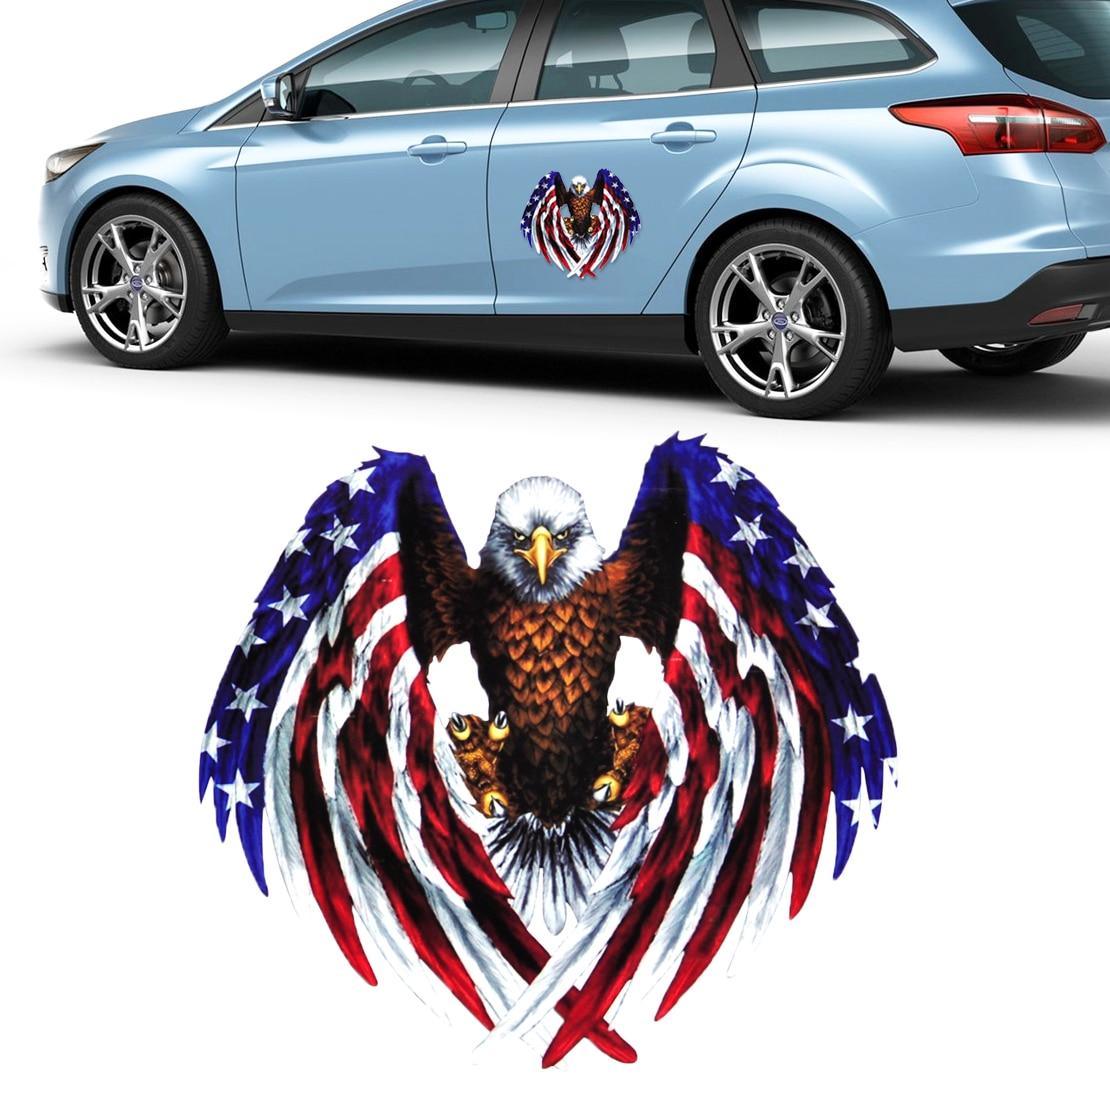 Car sticker eagle - Eagle American United States Usa Flag Sticker Decal Car Bumper Bike Laptop Window For Vw Ford